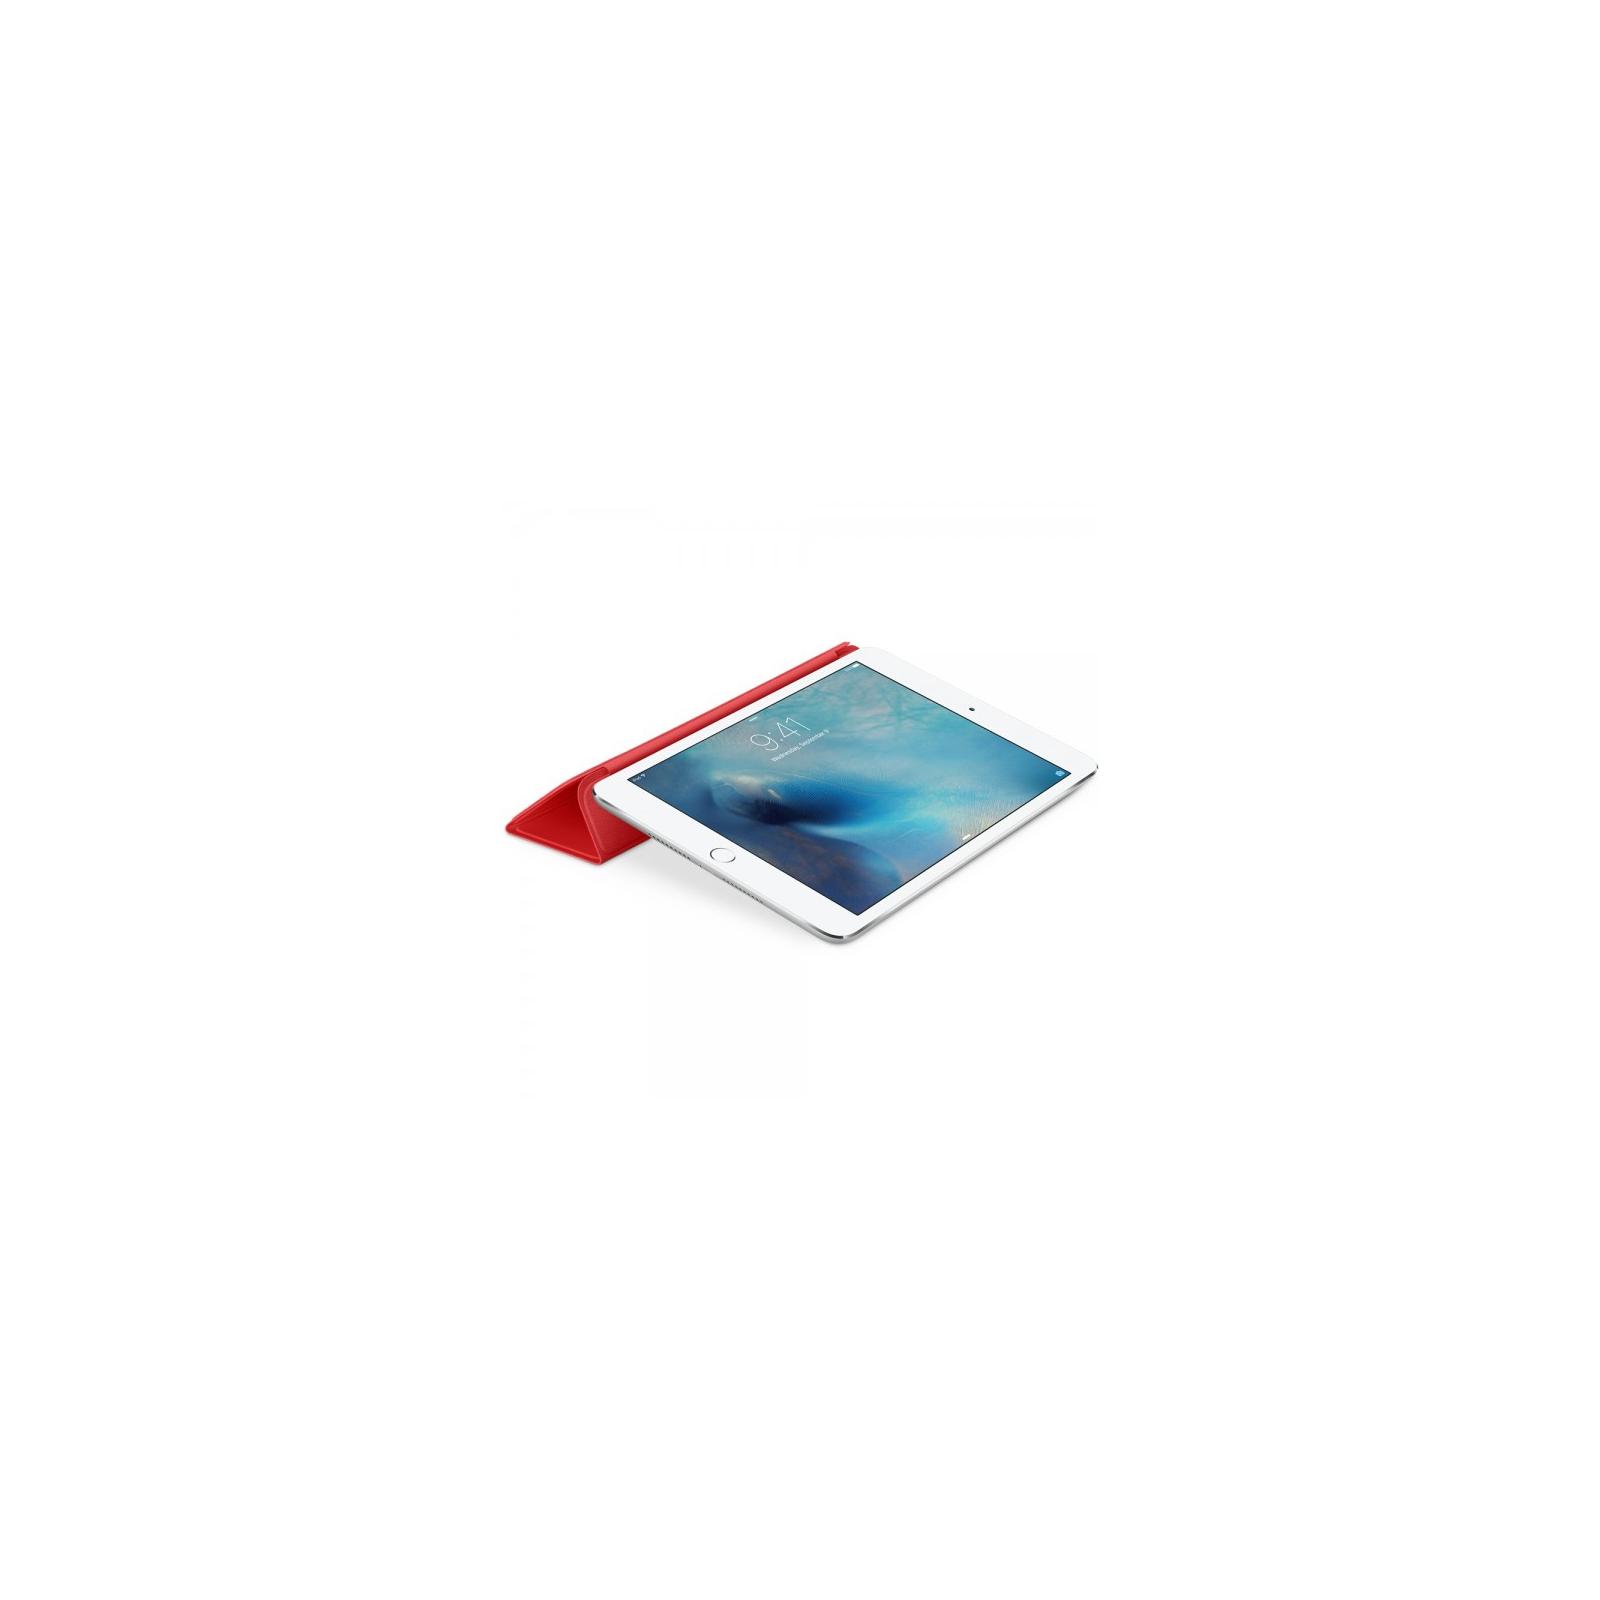 Чехол для планшета Apple Smart Cover для iPad mini 4 Red (MKLY2ZM/A) изображение 4